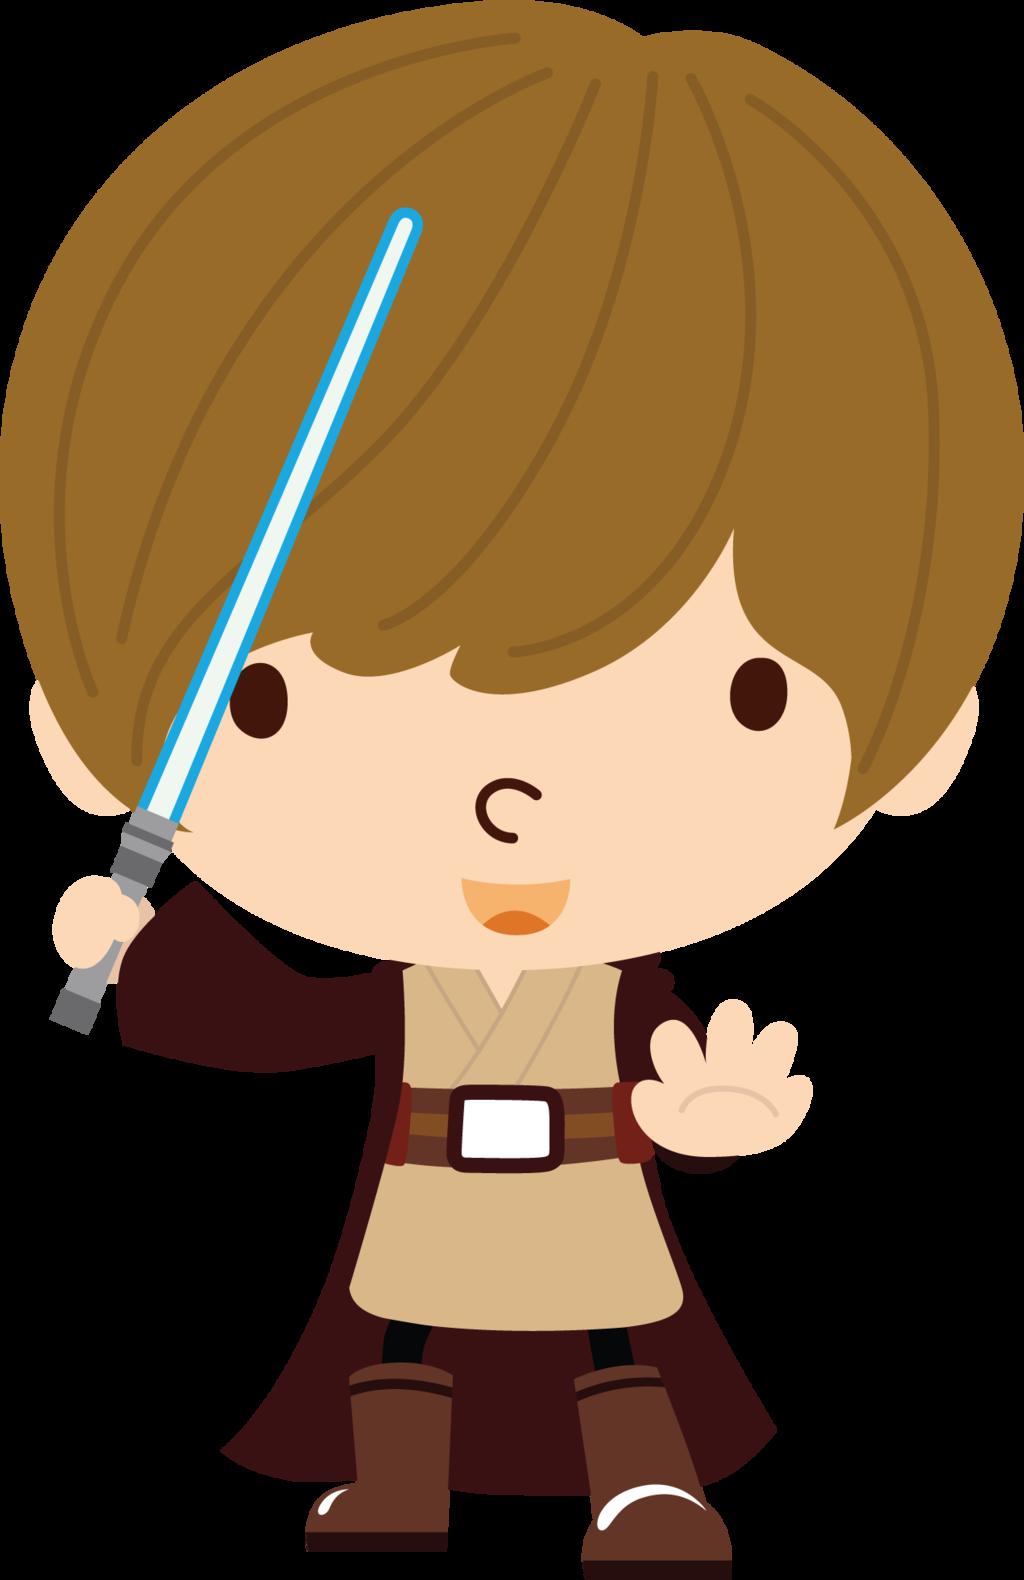 1024x1580 Lightsaber Star Wars Clip Art By Chrispix